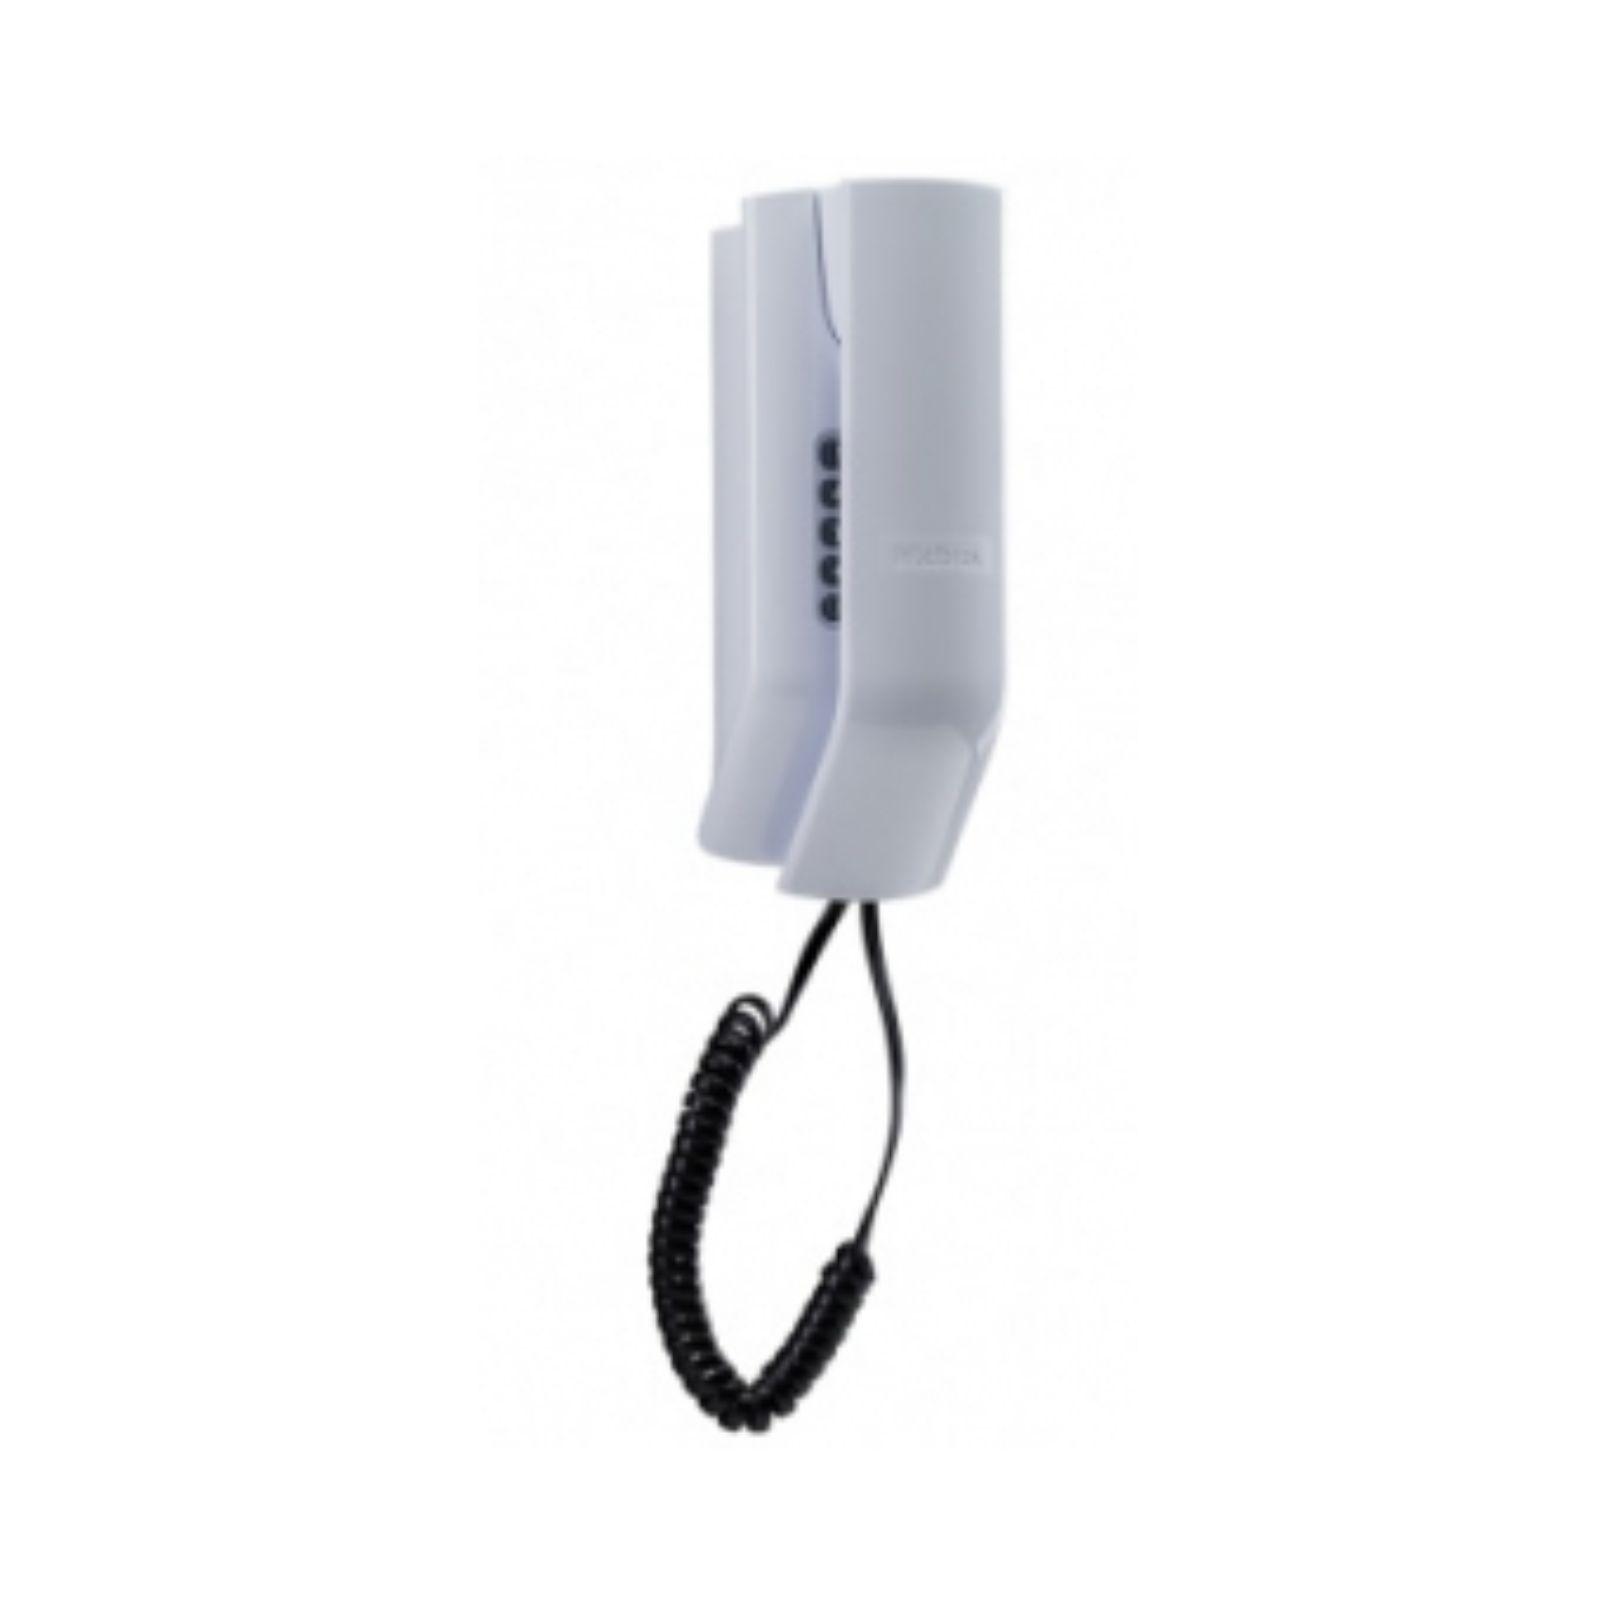 TELEFONE BABY TDMI-300 BRANCO